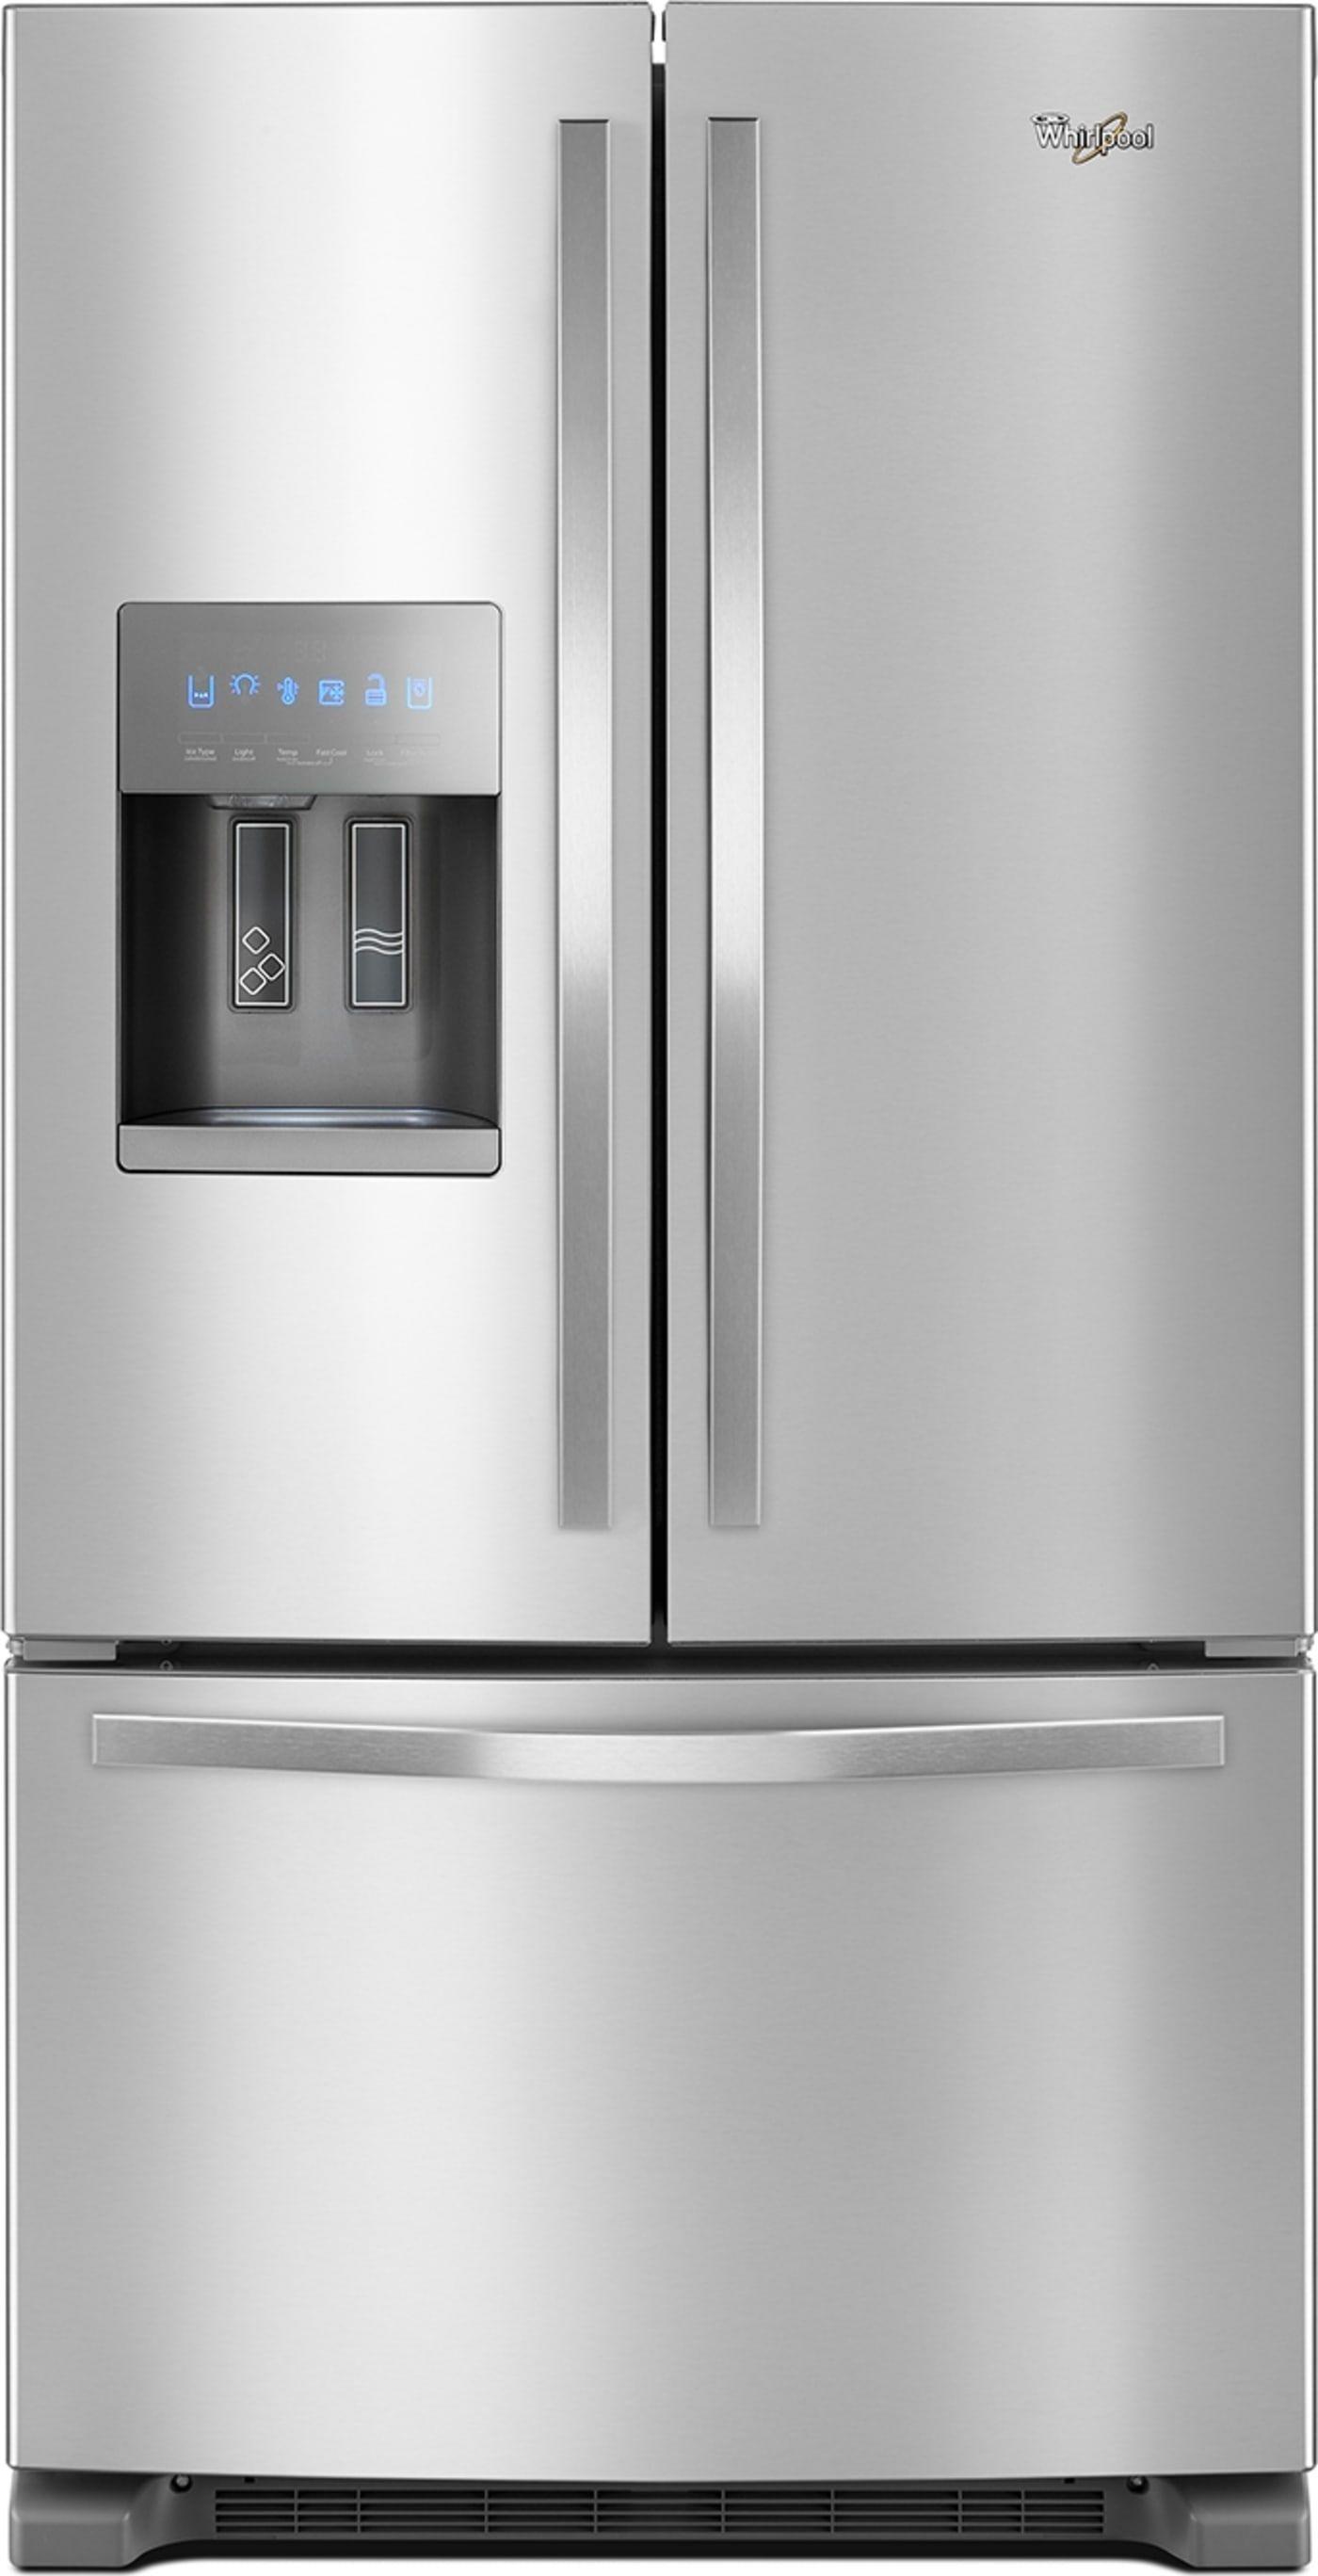 Wrf555sdfz By Whirlpool French Door Refrigerators Goedekers Com French Door Refrigerator Stainless Steel Fridge Refrigerator Whirlpool